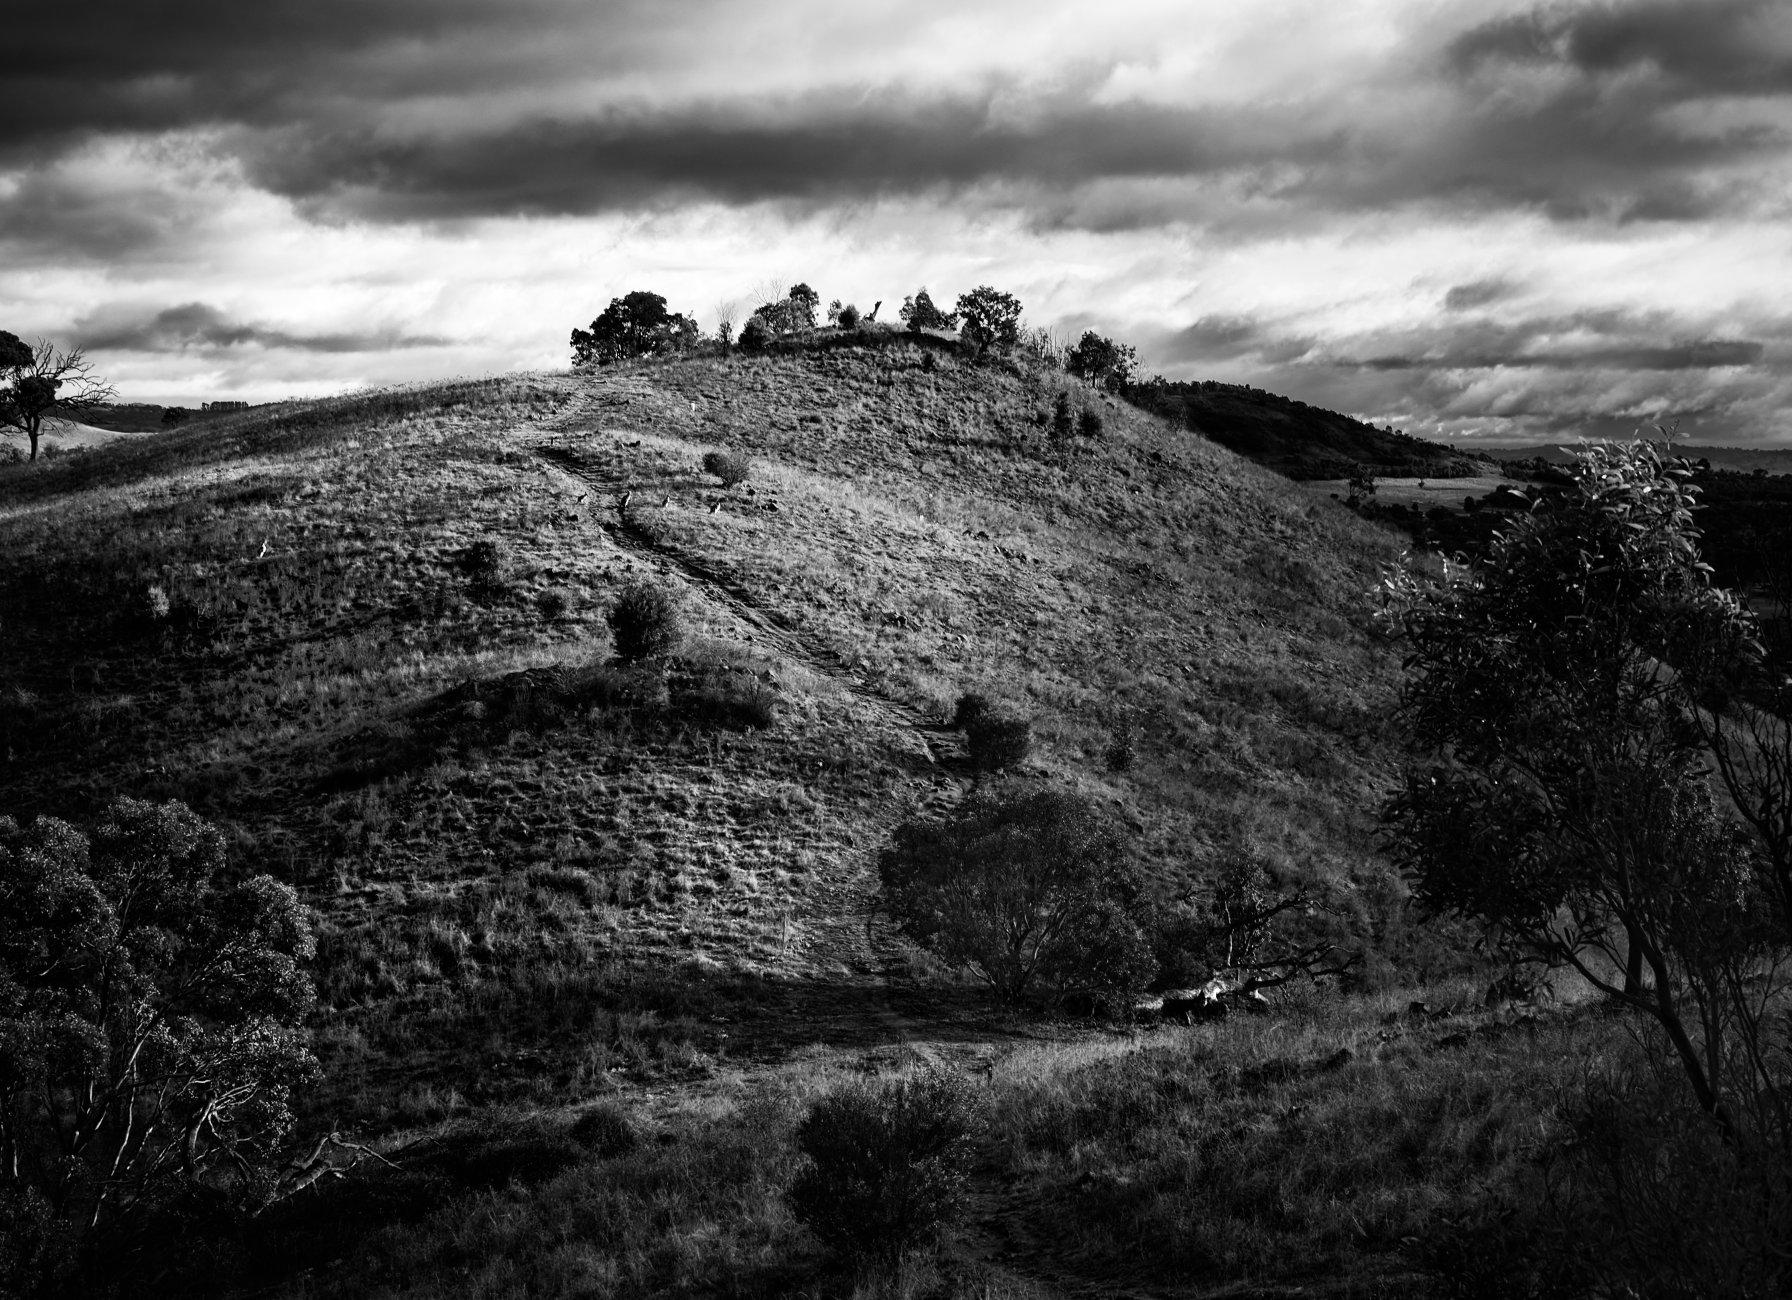 Winter Storm Approaching, Urambi Hills